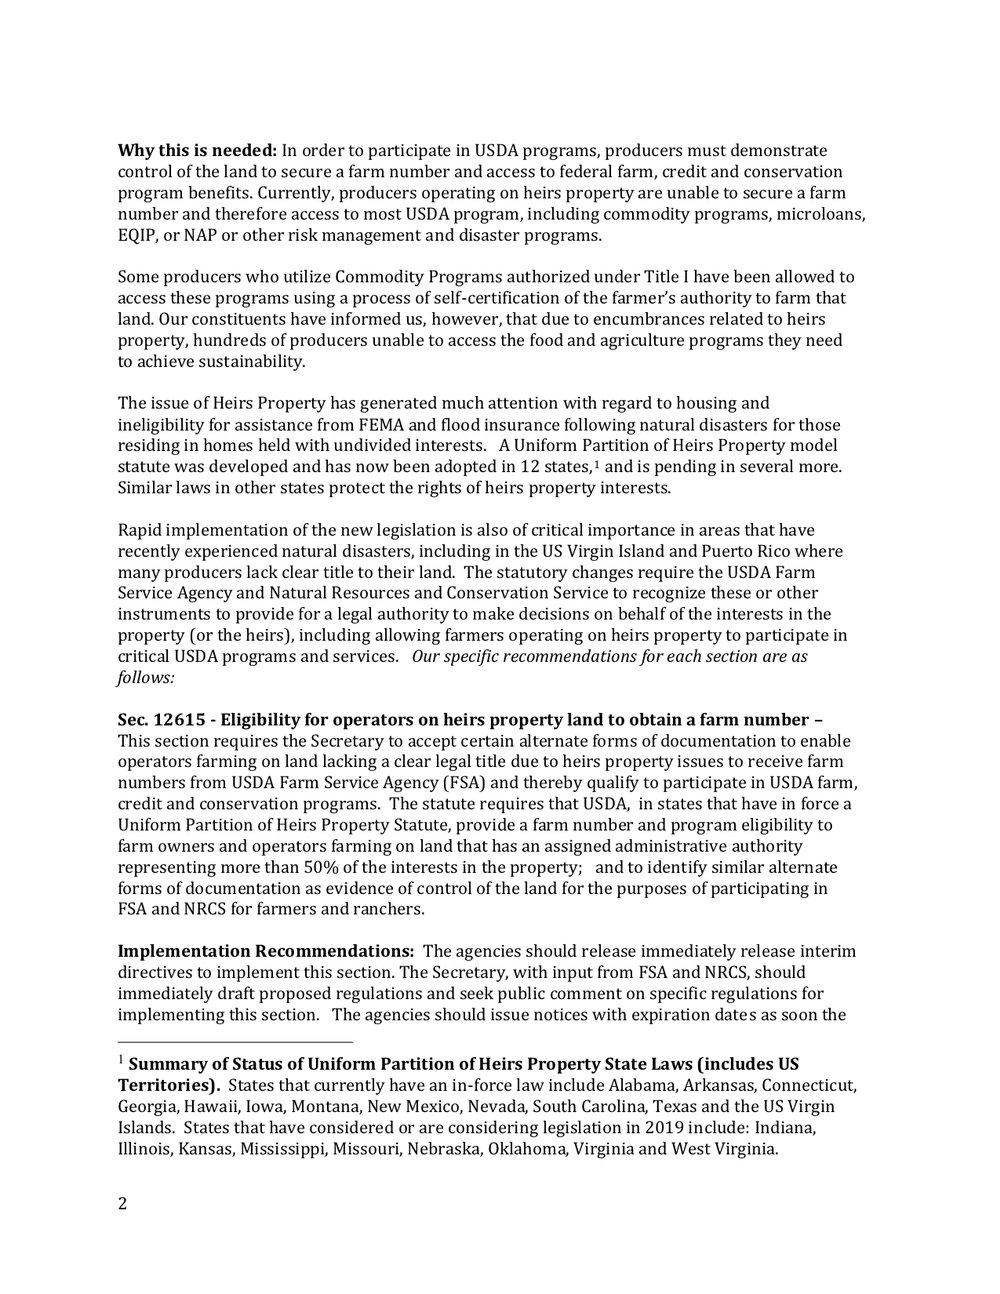 2018 Farm Bill Implementation Recommendations - Rural Co etal final March 1 page 3.jpg